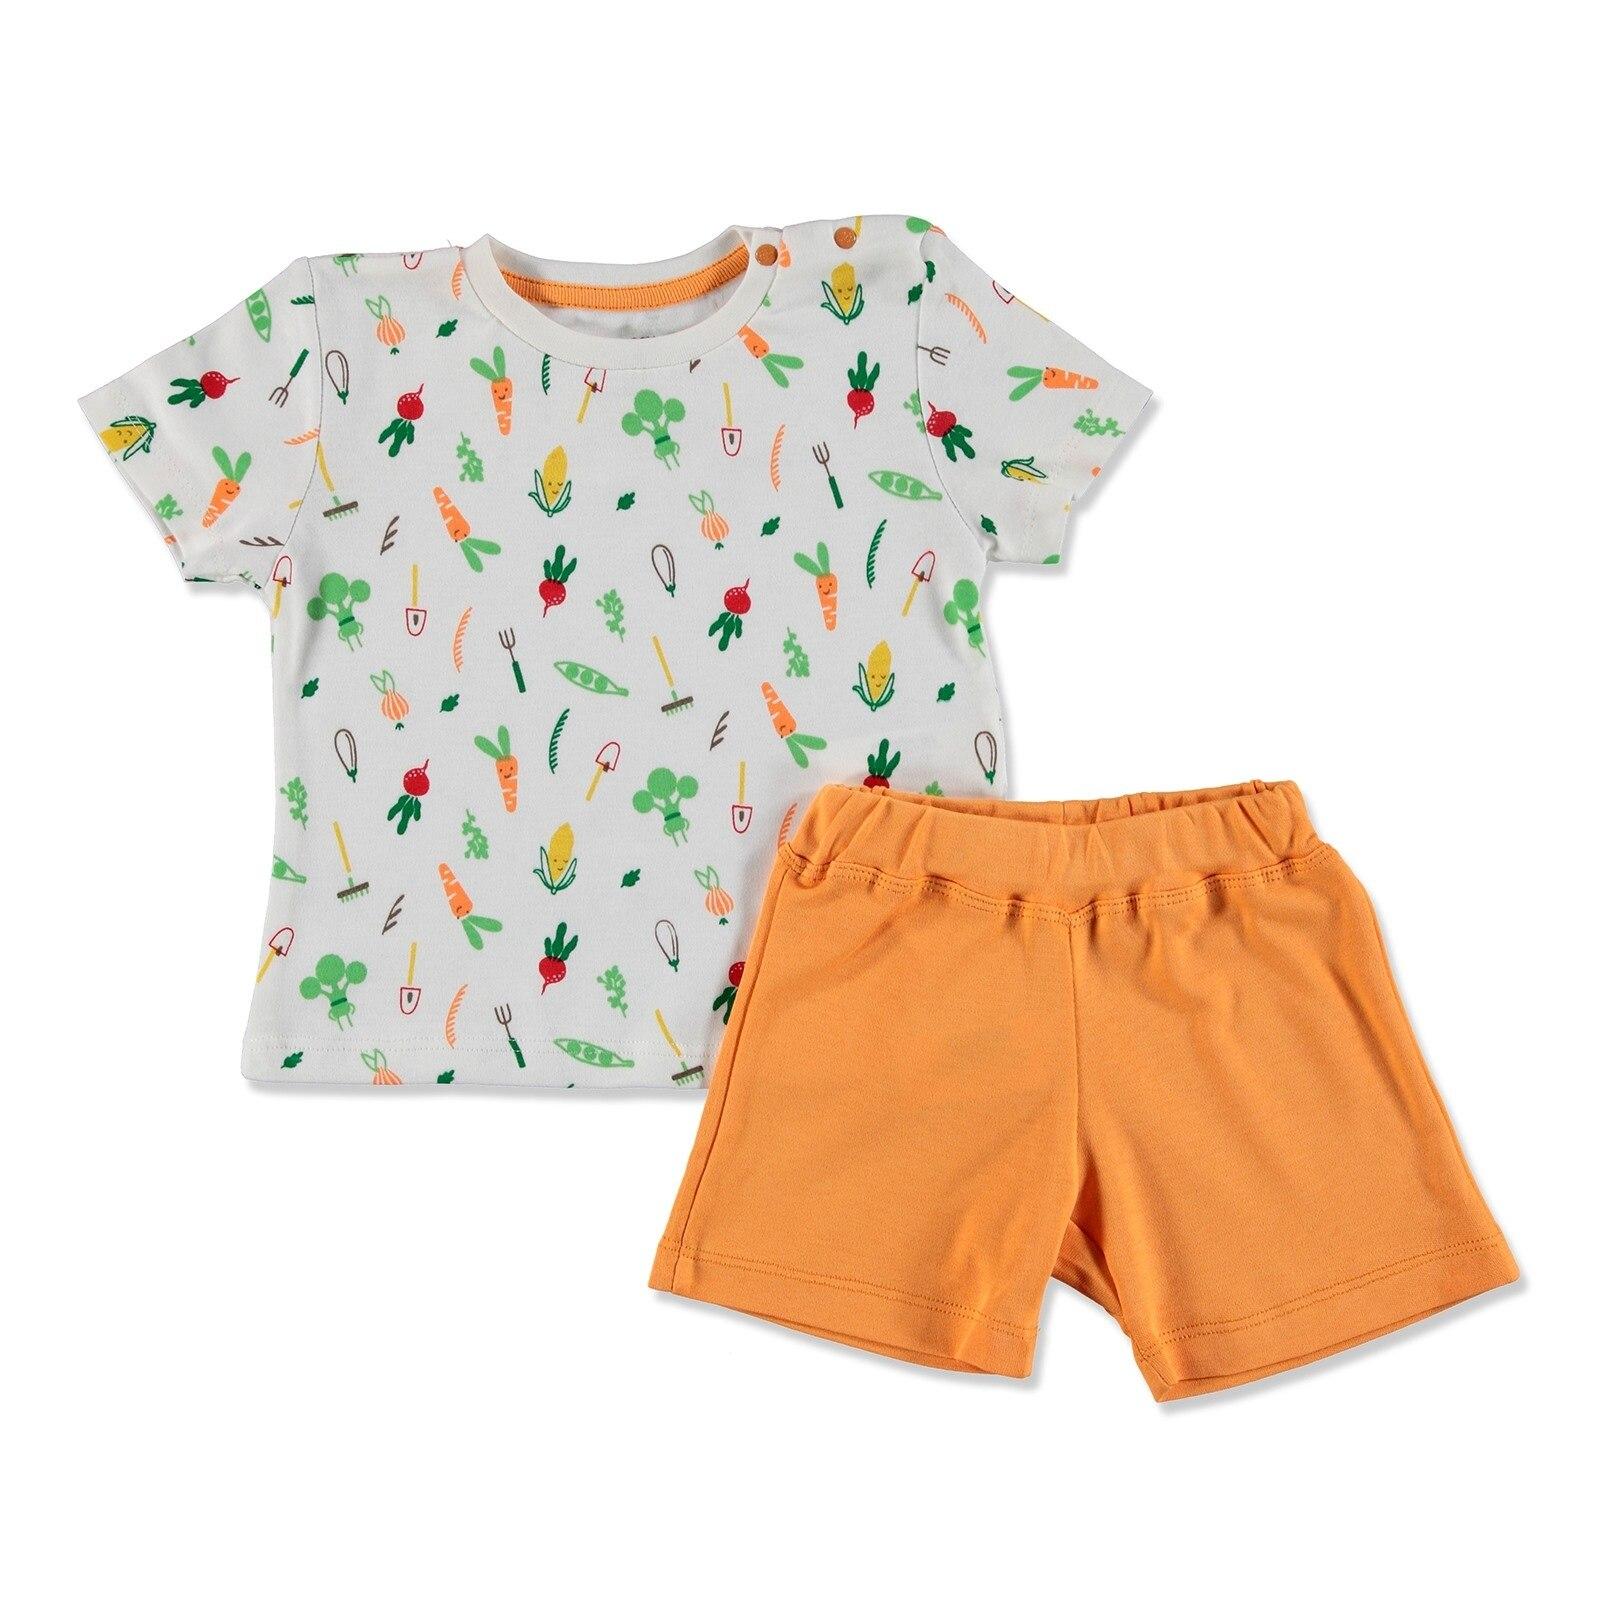 Ebebek HelloBaby Summer Baby Sweet Vegetables T-shirt Short Set